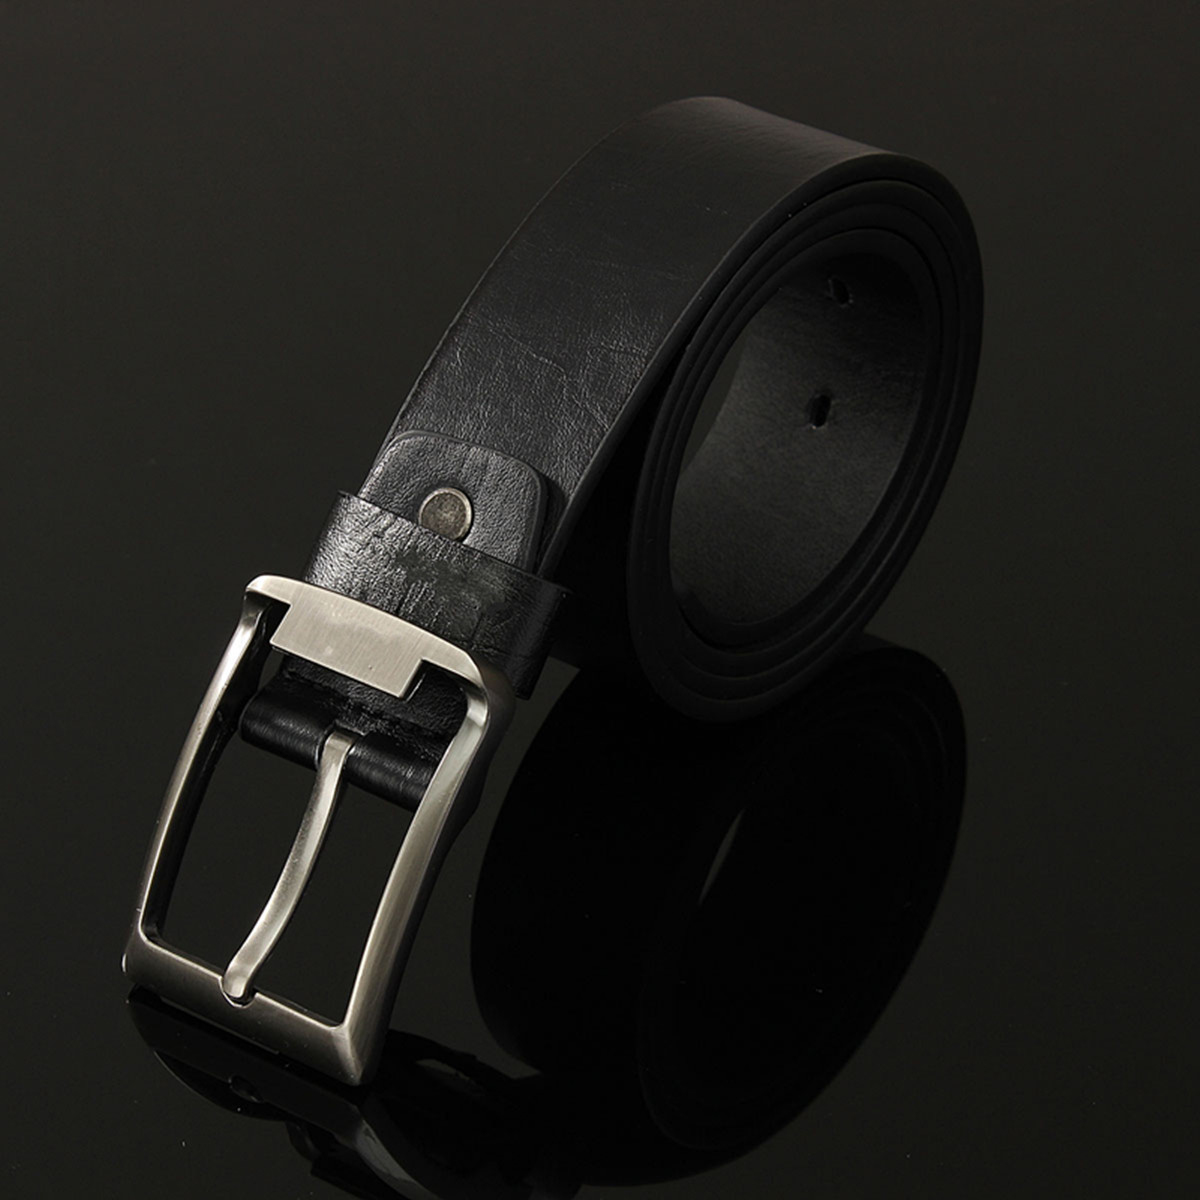 Fashion Men's Luxury Leather  Vintage Classic Pin WaistBand Strap Waist Belts